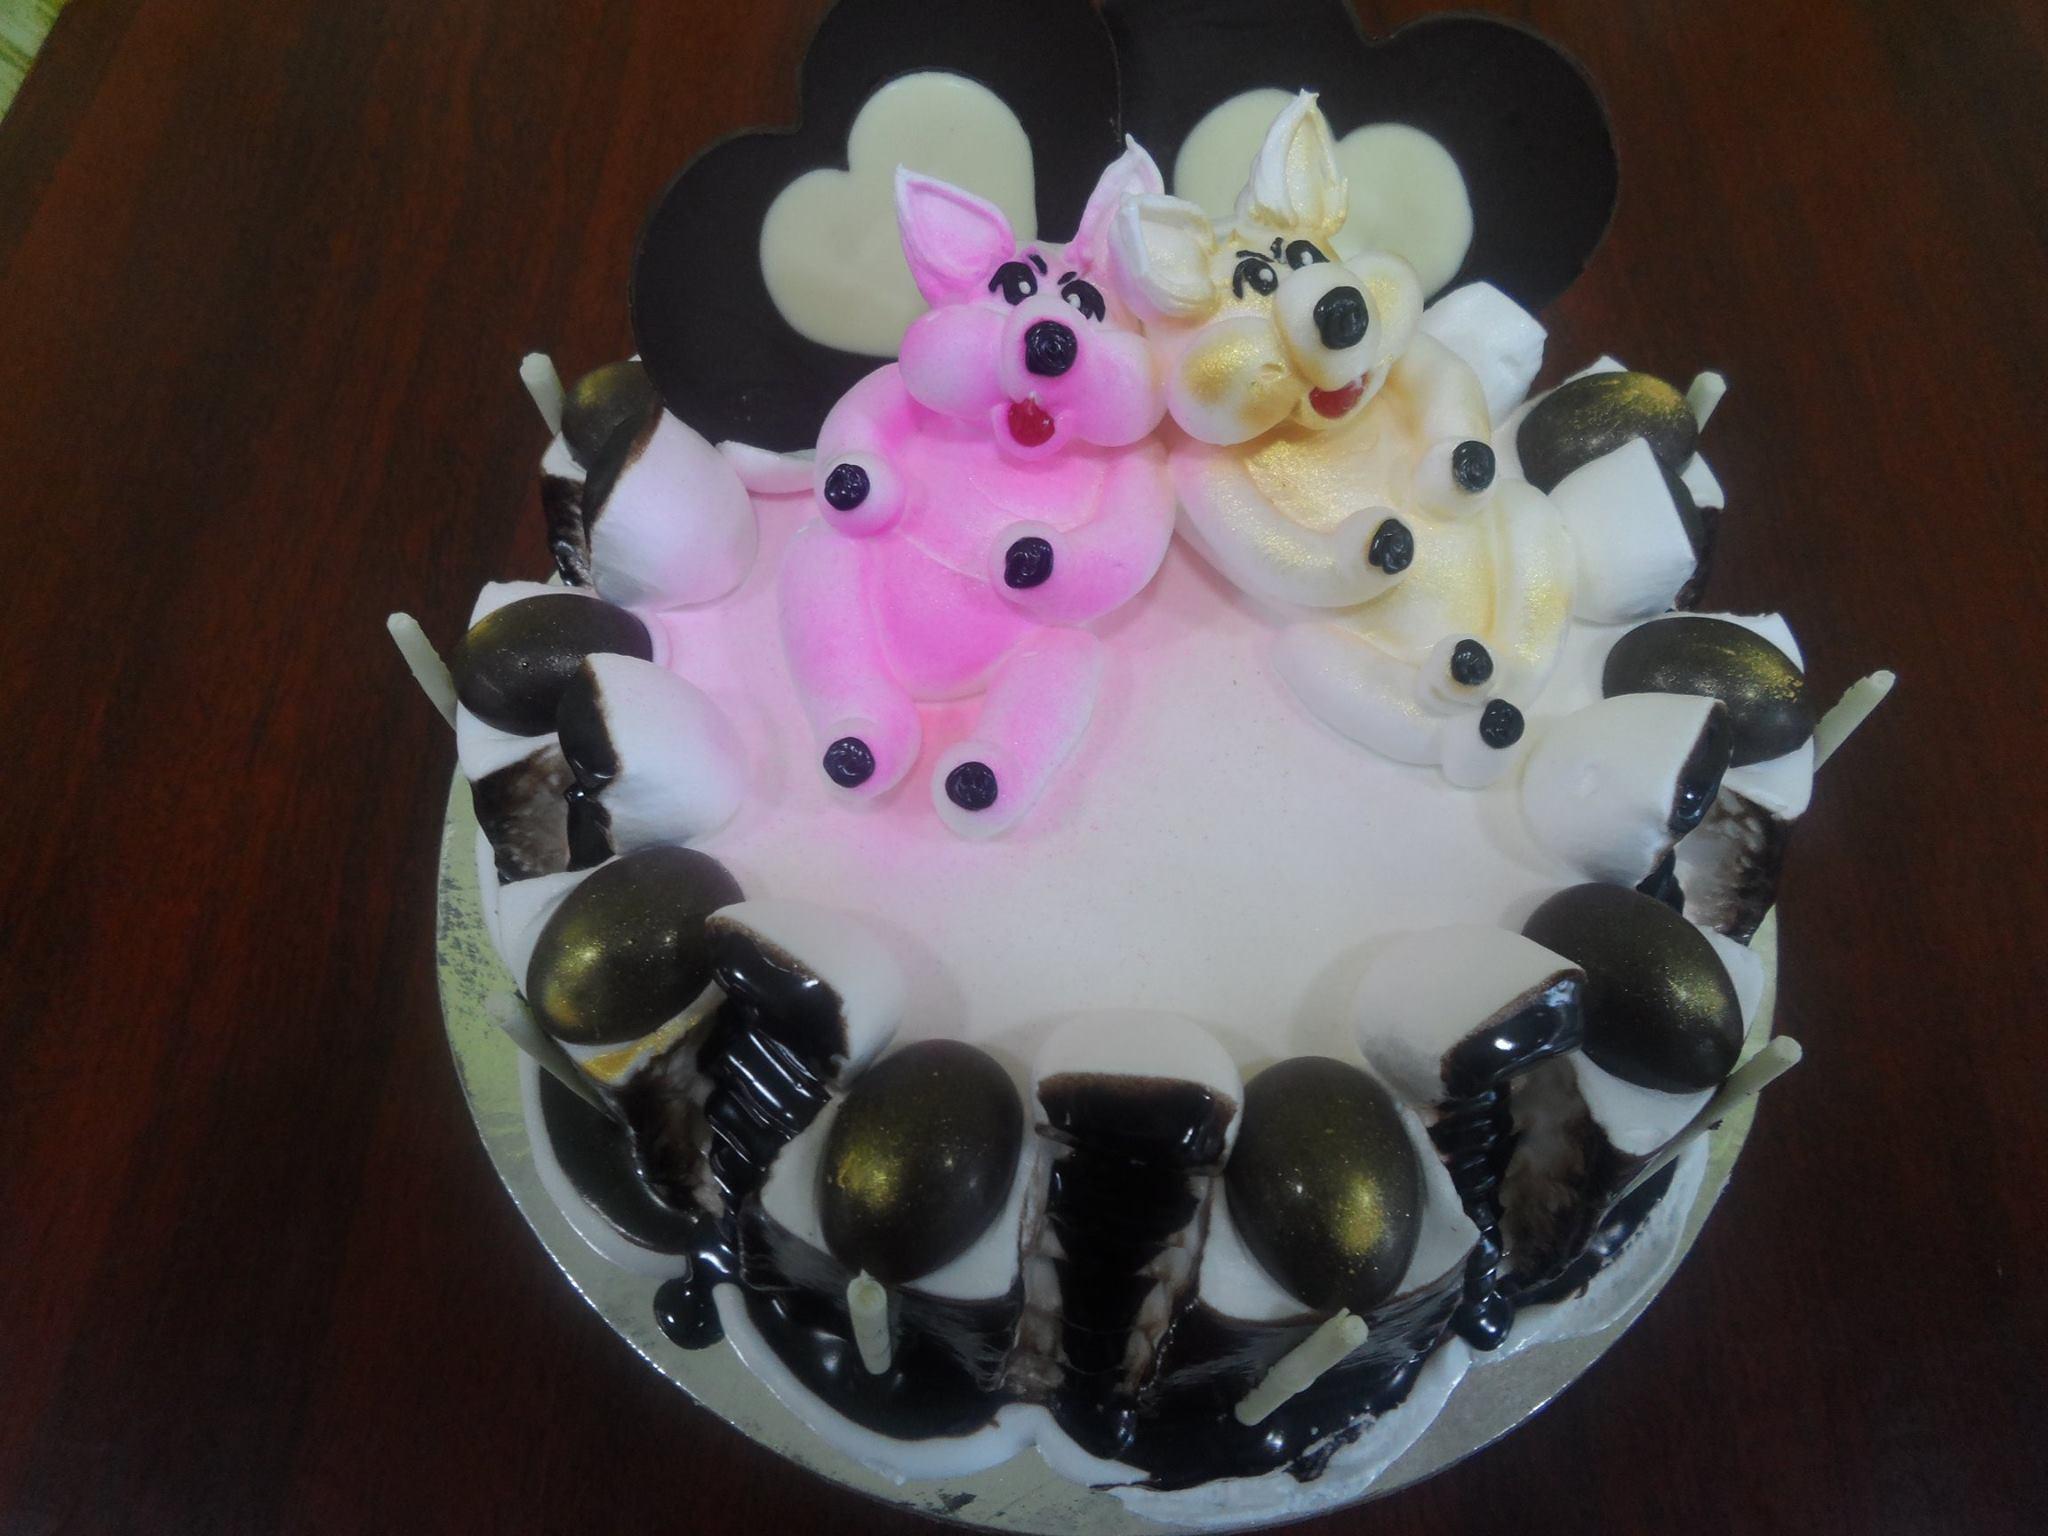 choco truffle with cute rabbits